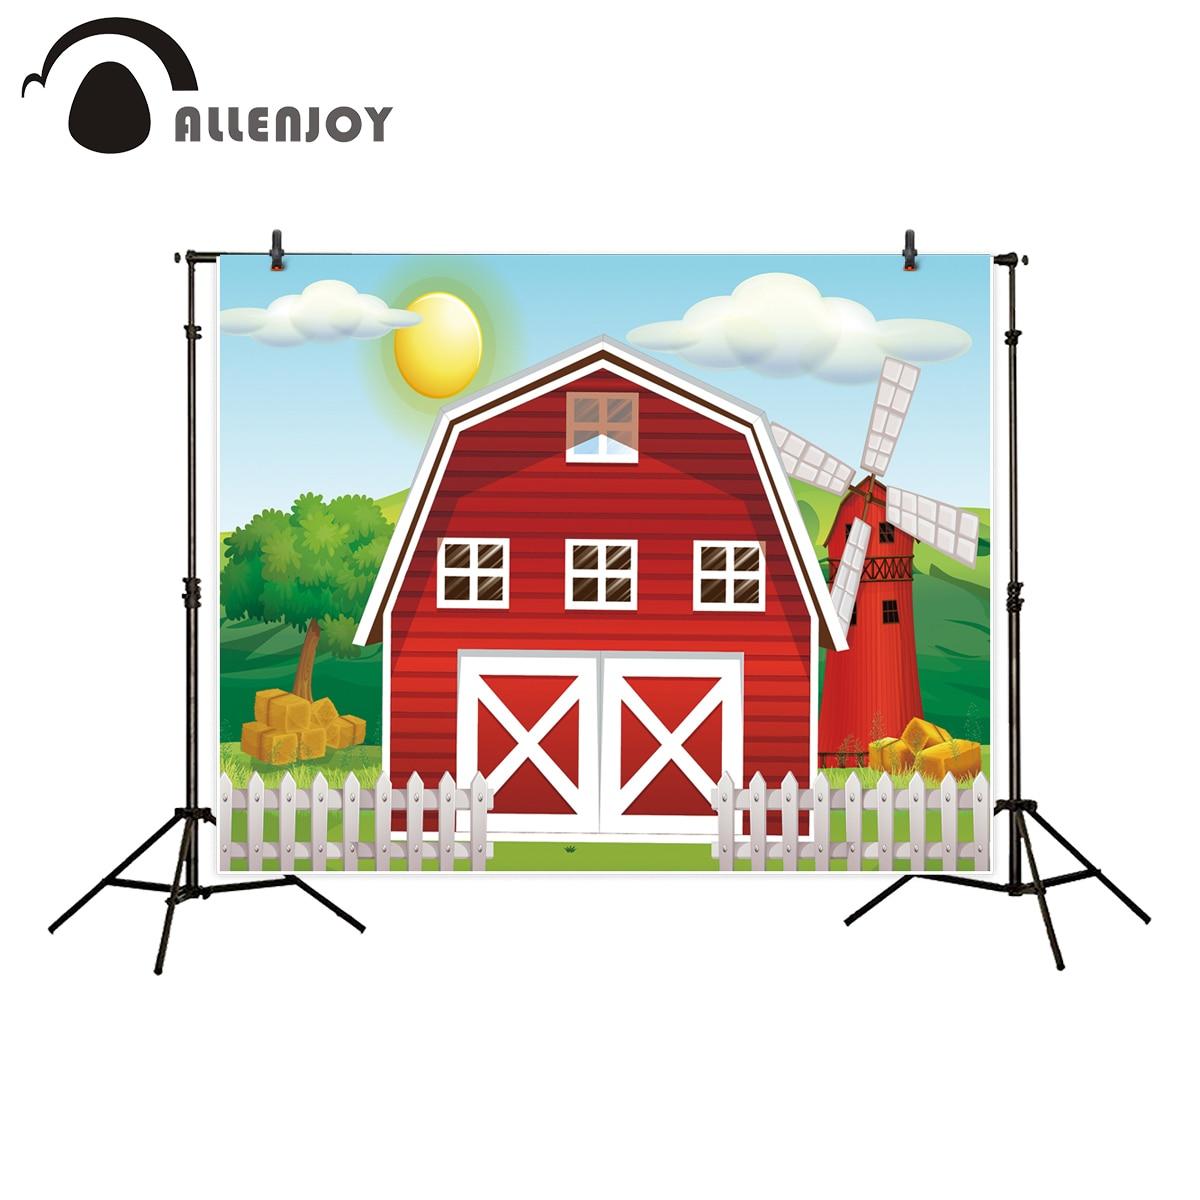 Allenjoy Farm theme photography backdrop red barn Barnyard house kids birthday illustration background photo studio photobooth цена